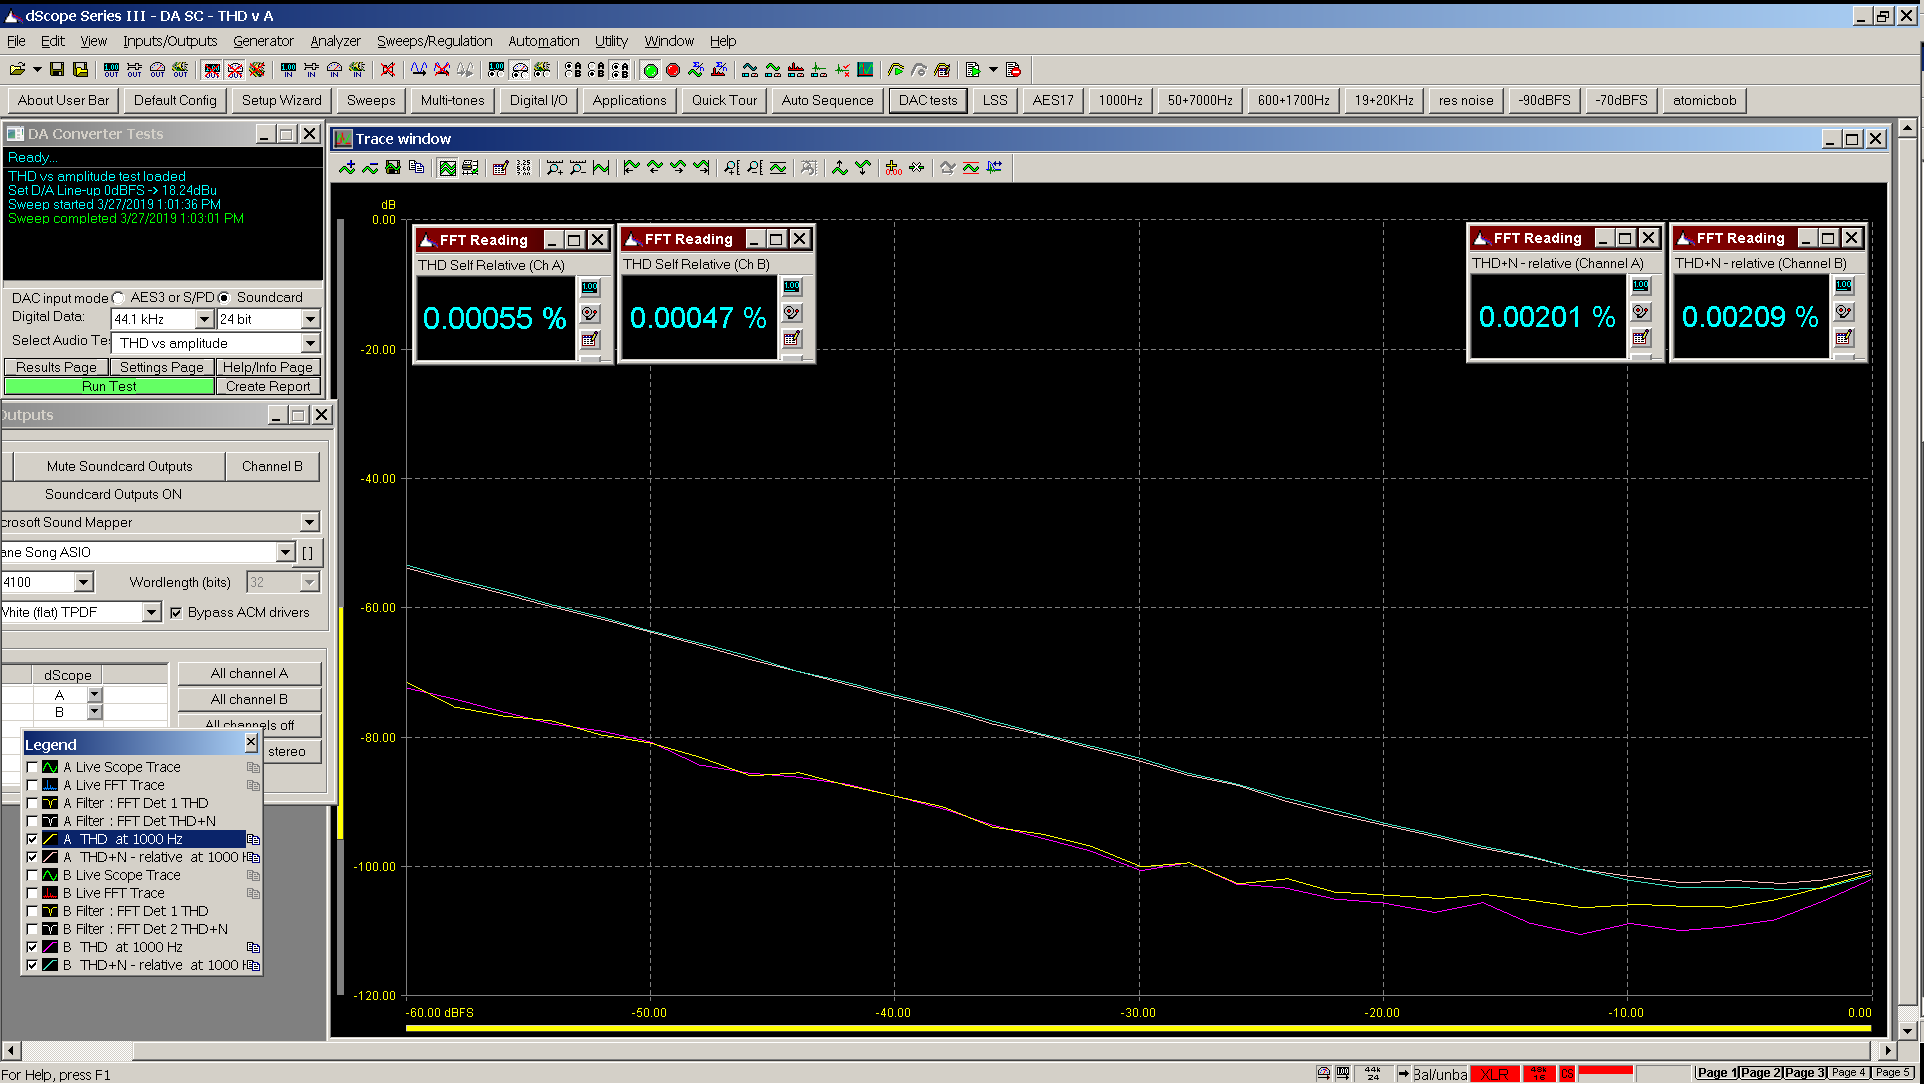 20190327-03 solaris Bal THD THD+N vs amplitude - USB.PNG